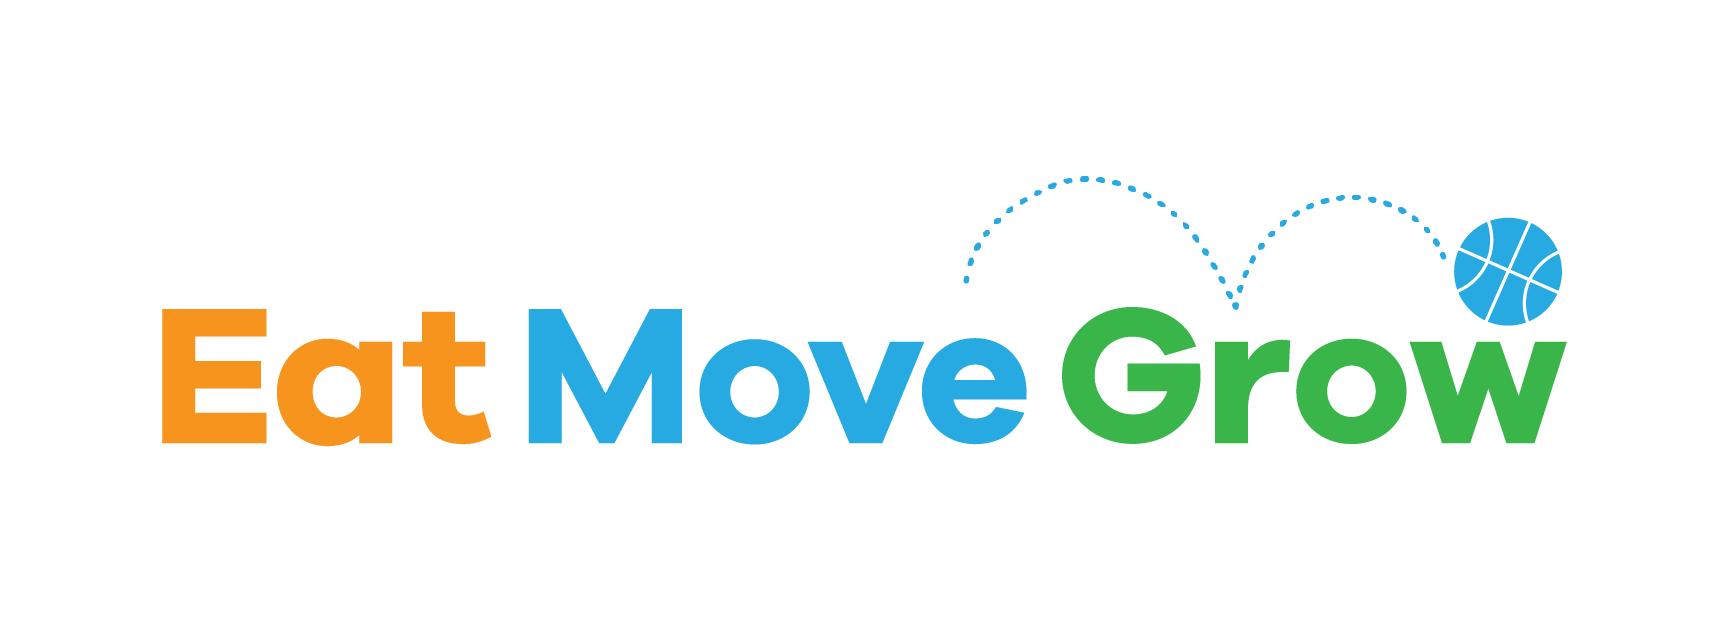 Eat Move Grow Logo